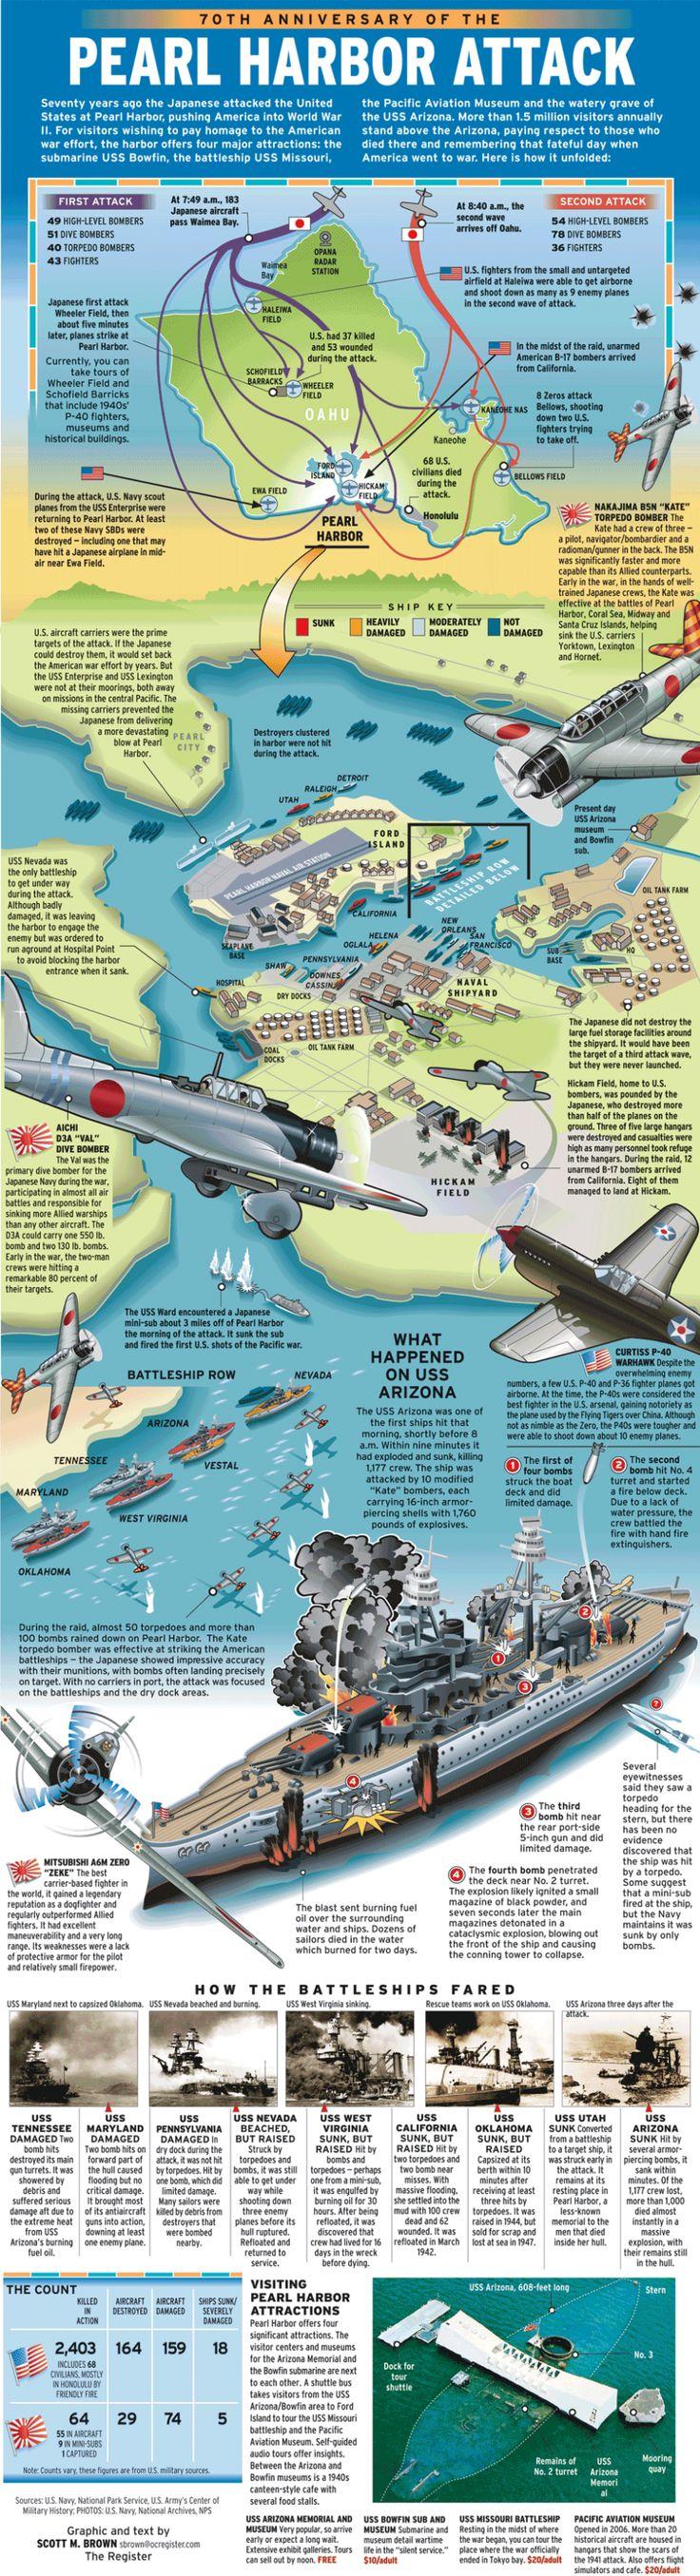 Ataque a Pearl Harbor en 6 infografías